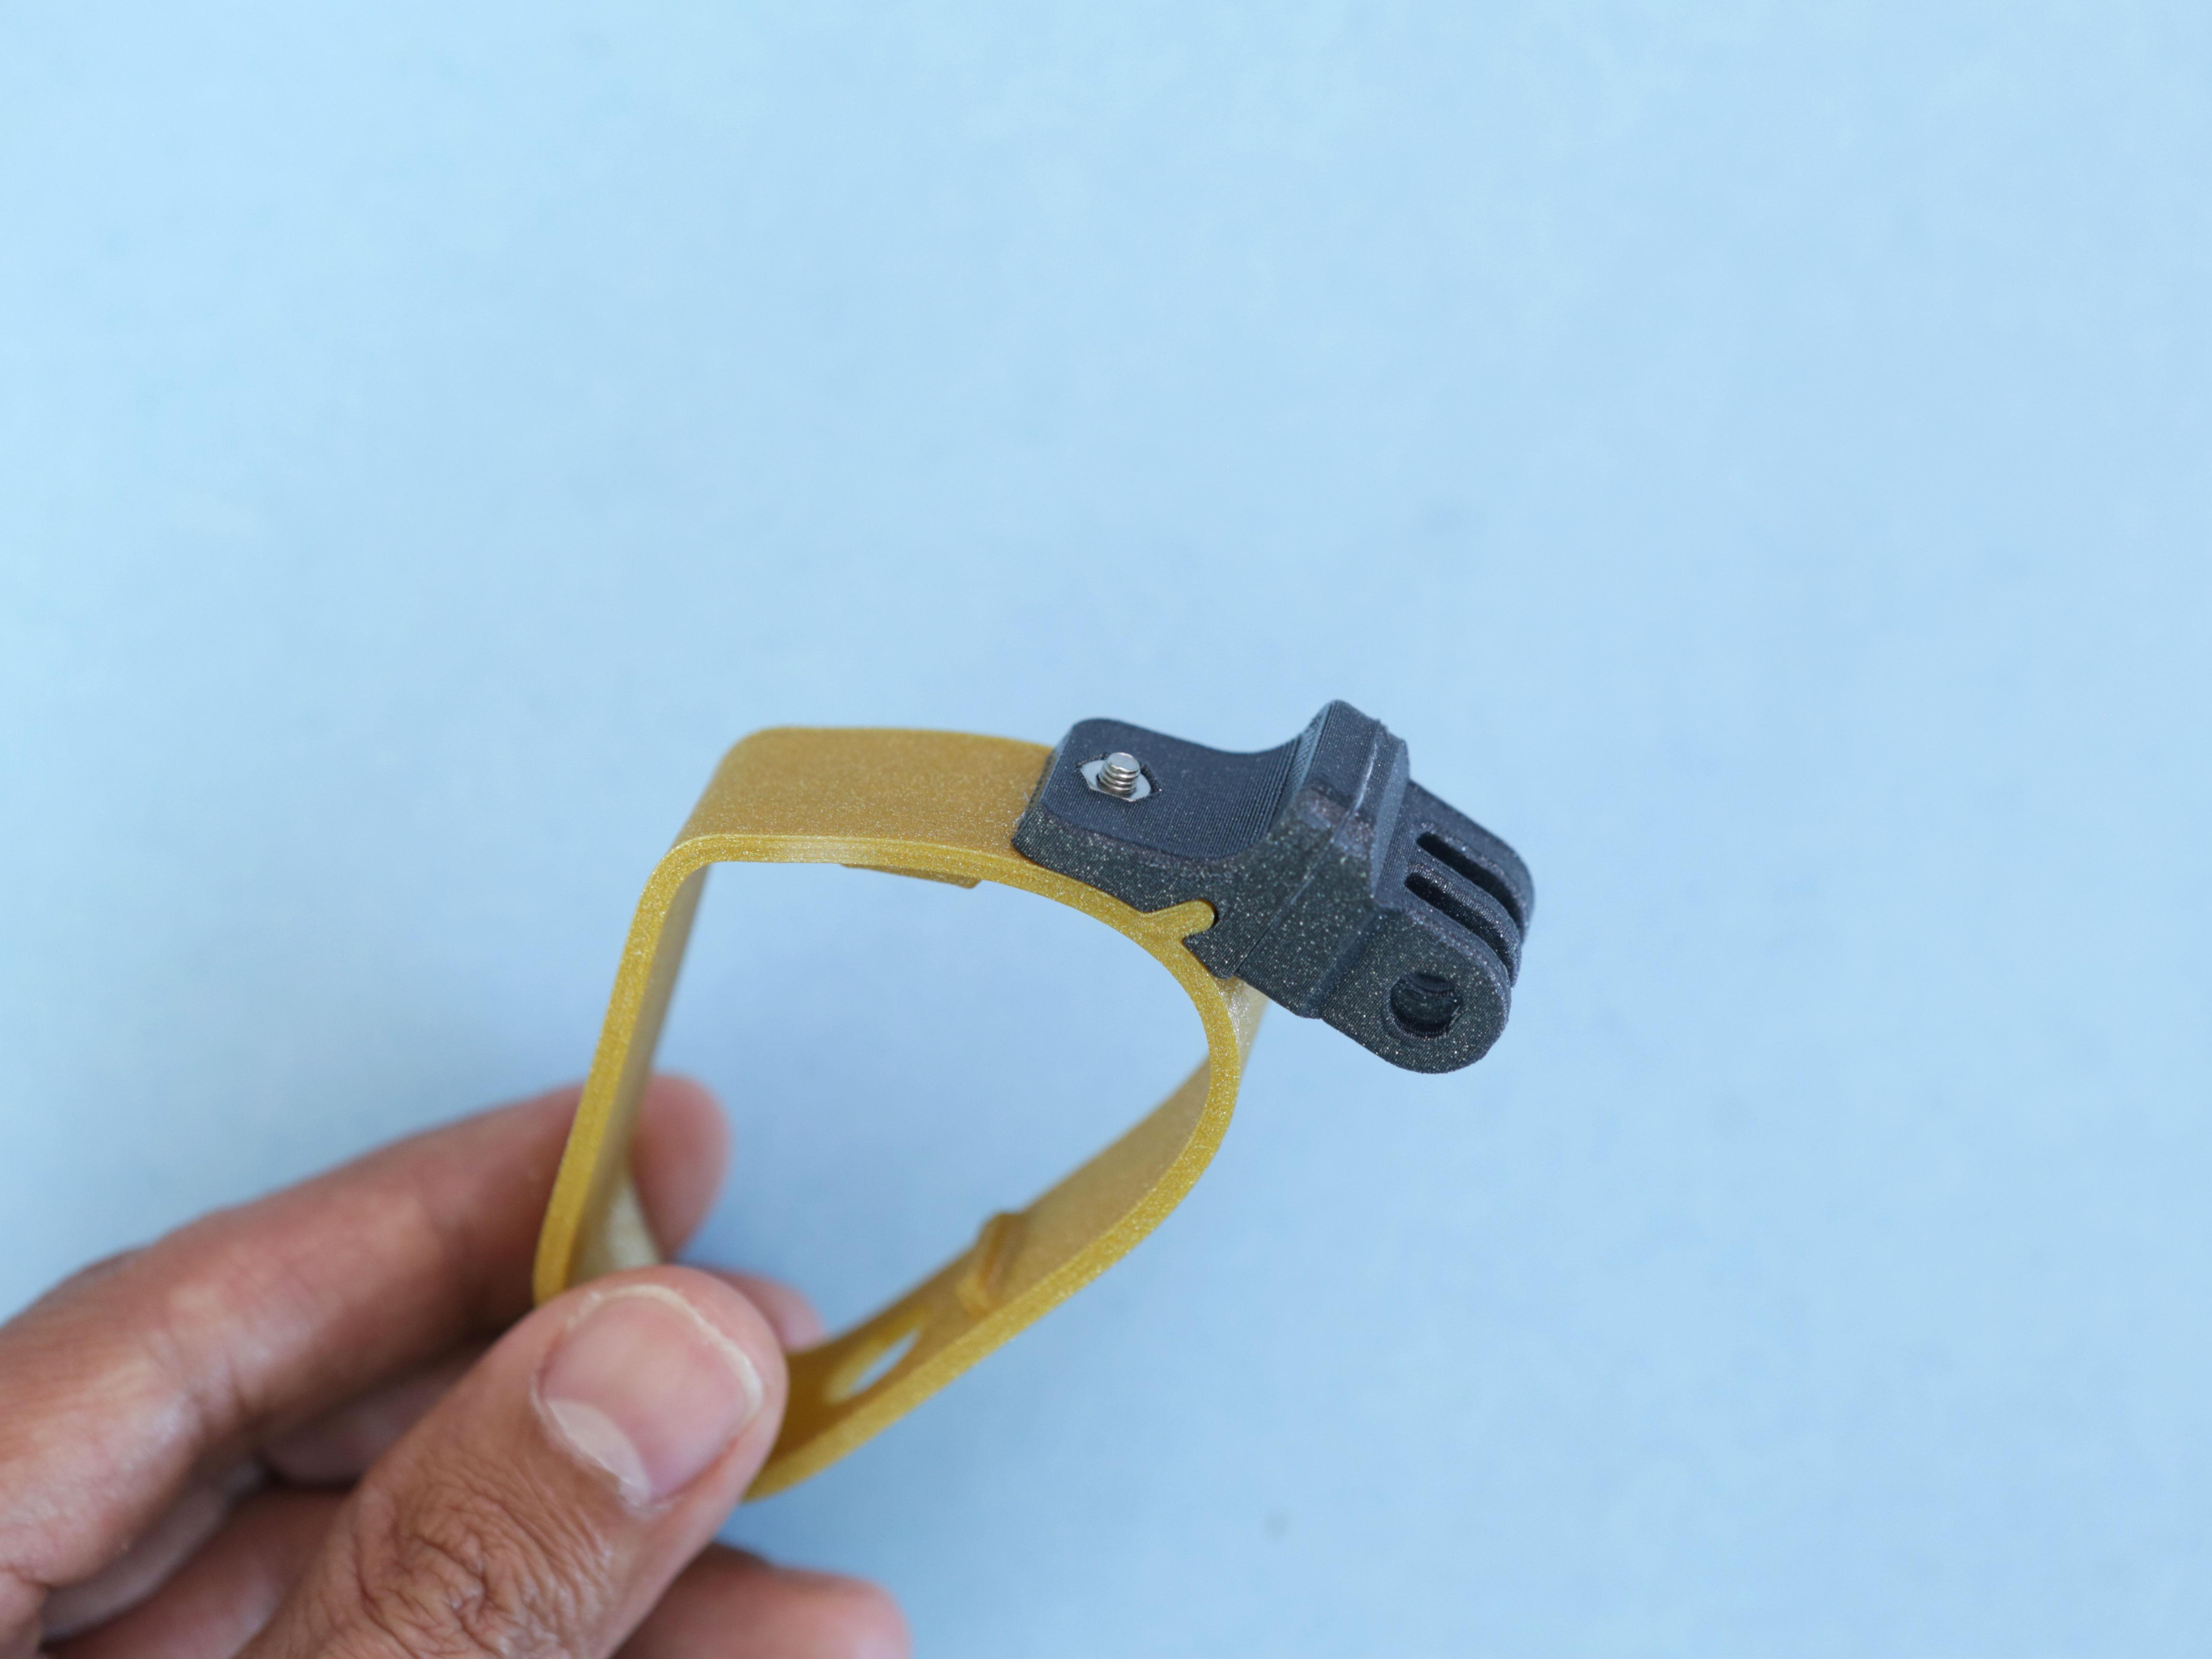 gaming_knuckle-clamp-secured.jpg